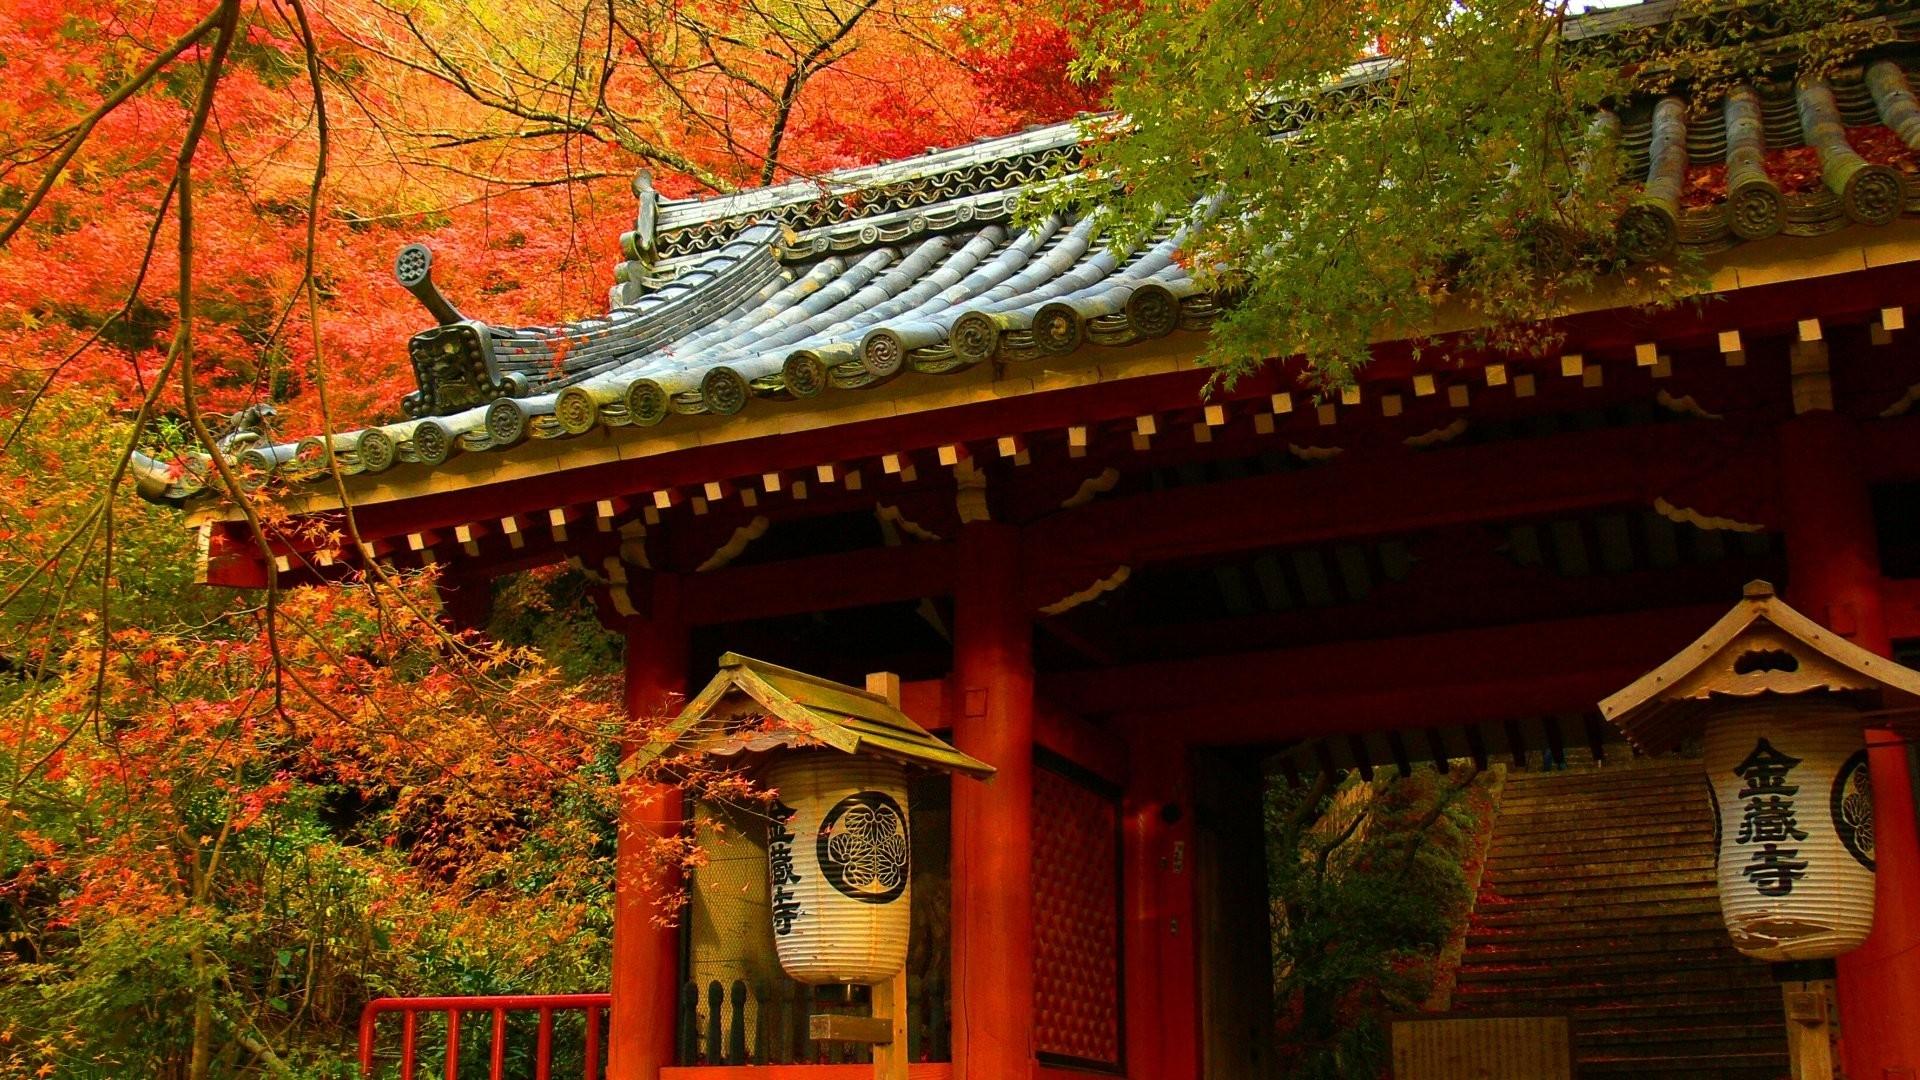 japan architecture wallpaper - photo #13